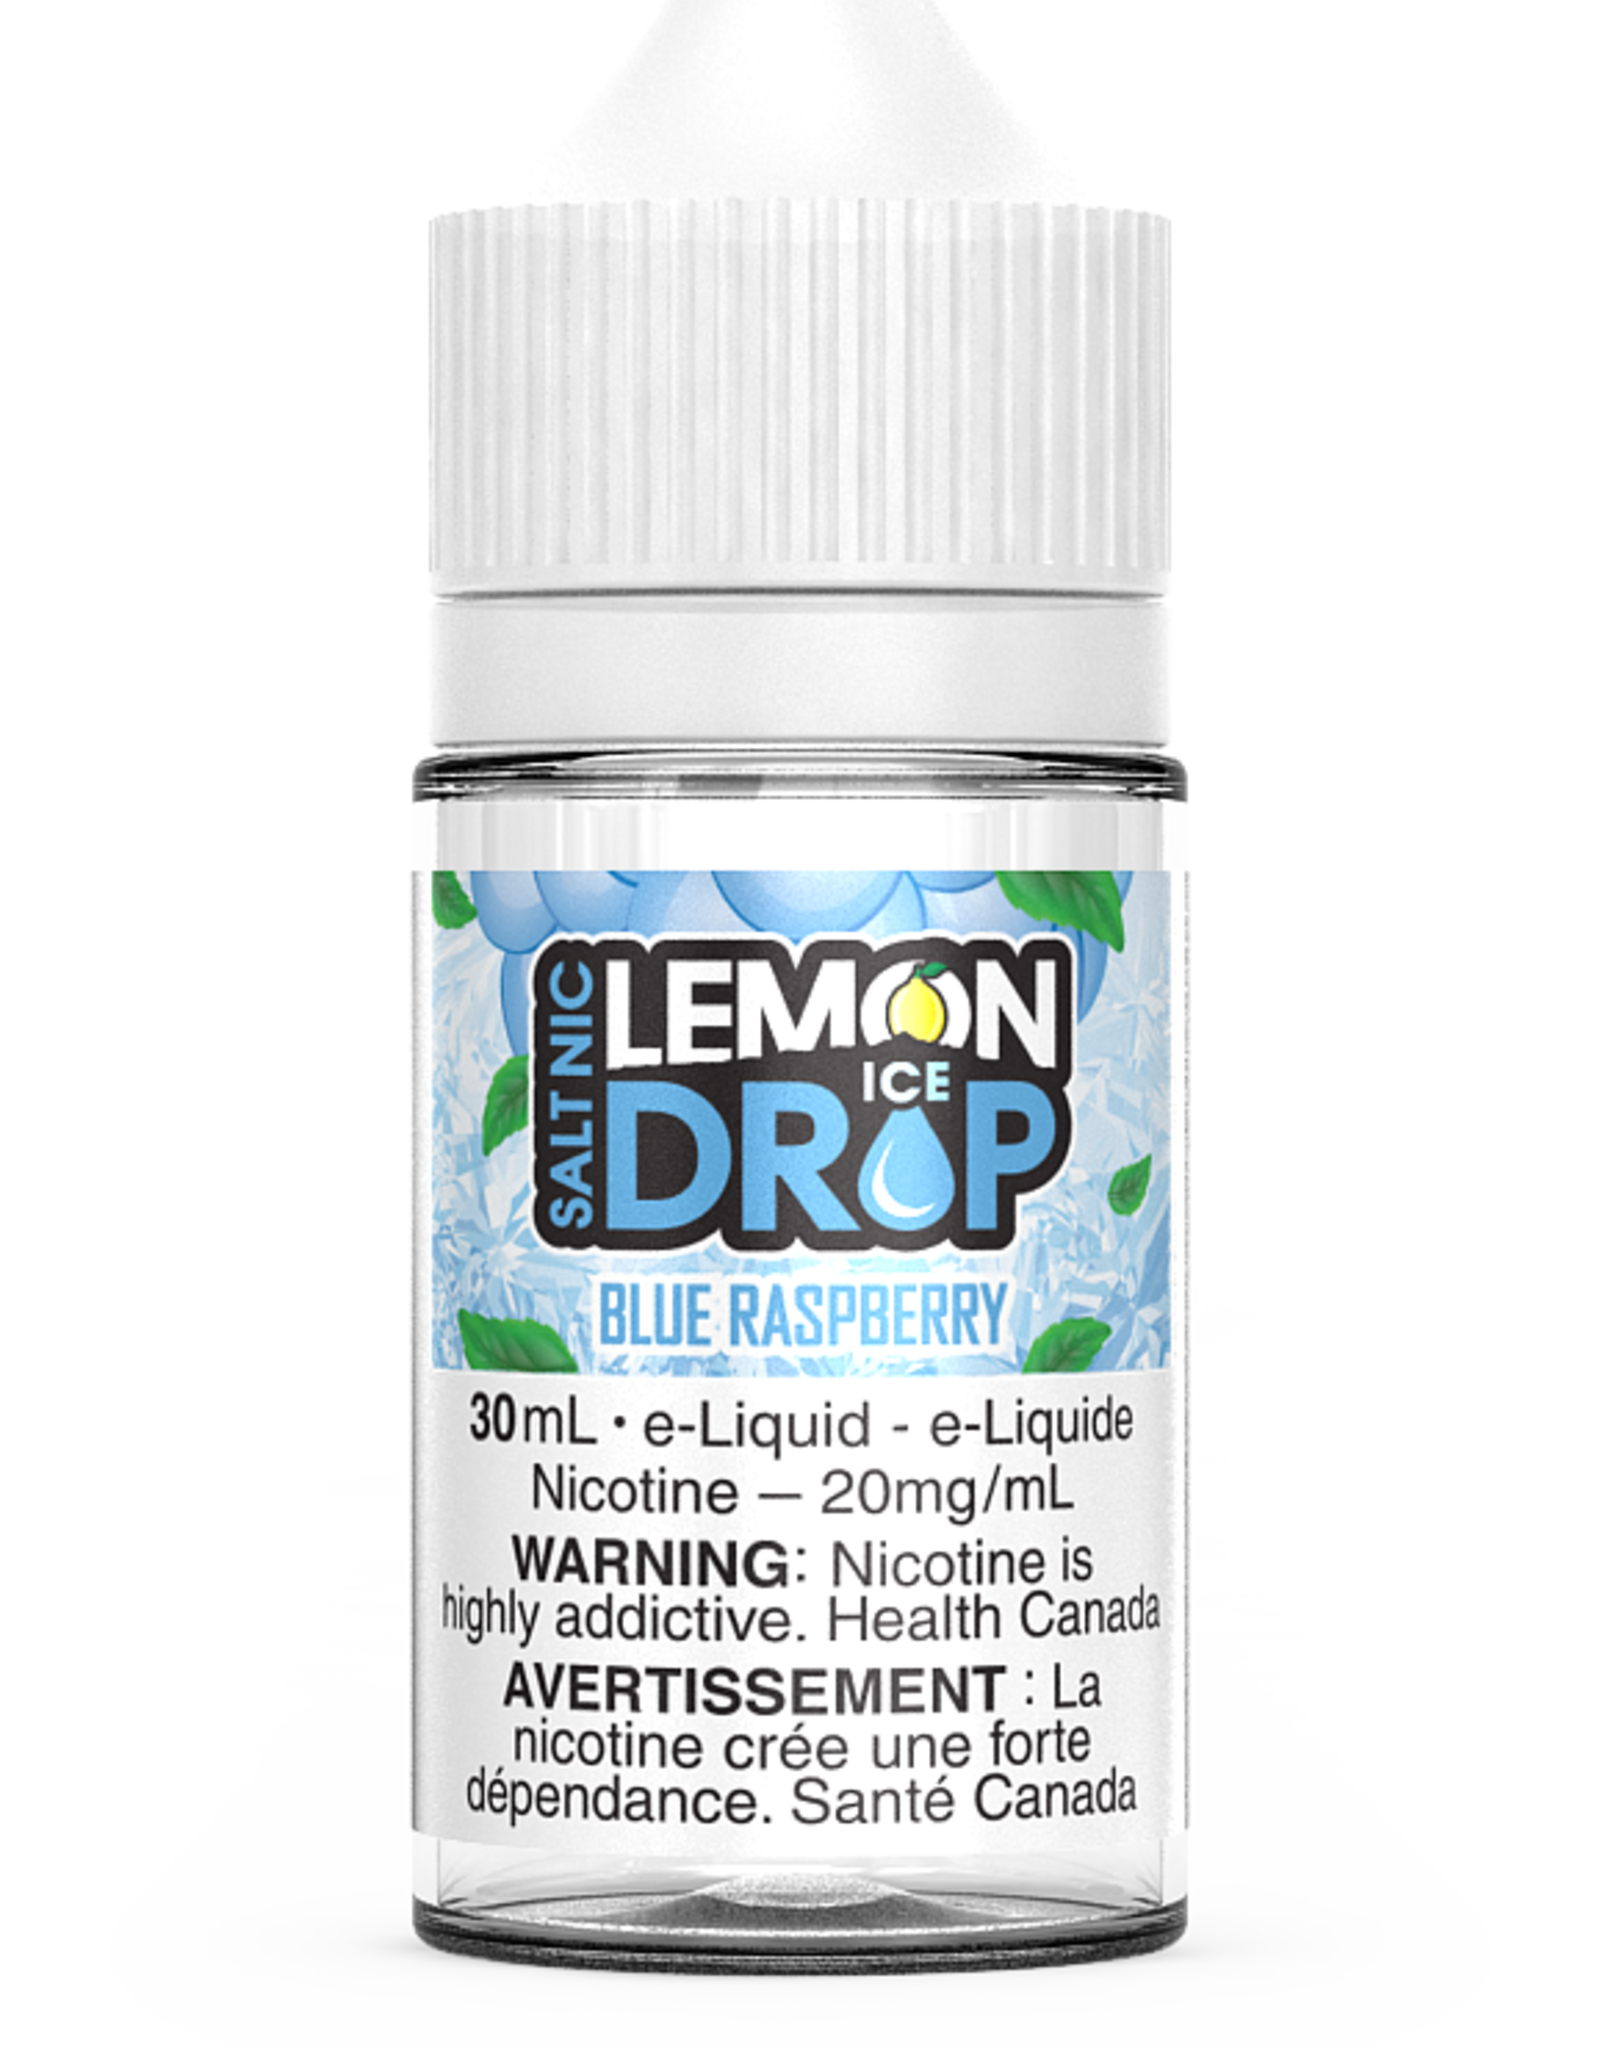 lLEMON DROP Blue Raspberry Ice Salt By Lemon Drop 20mg